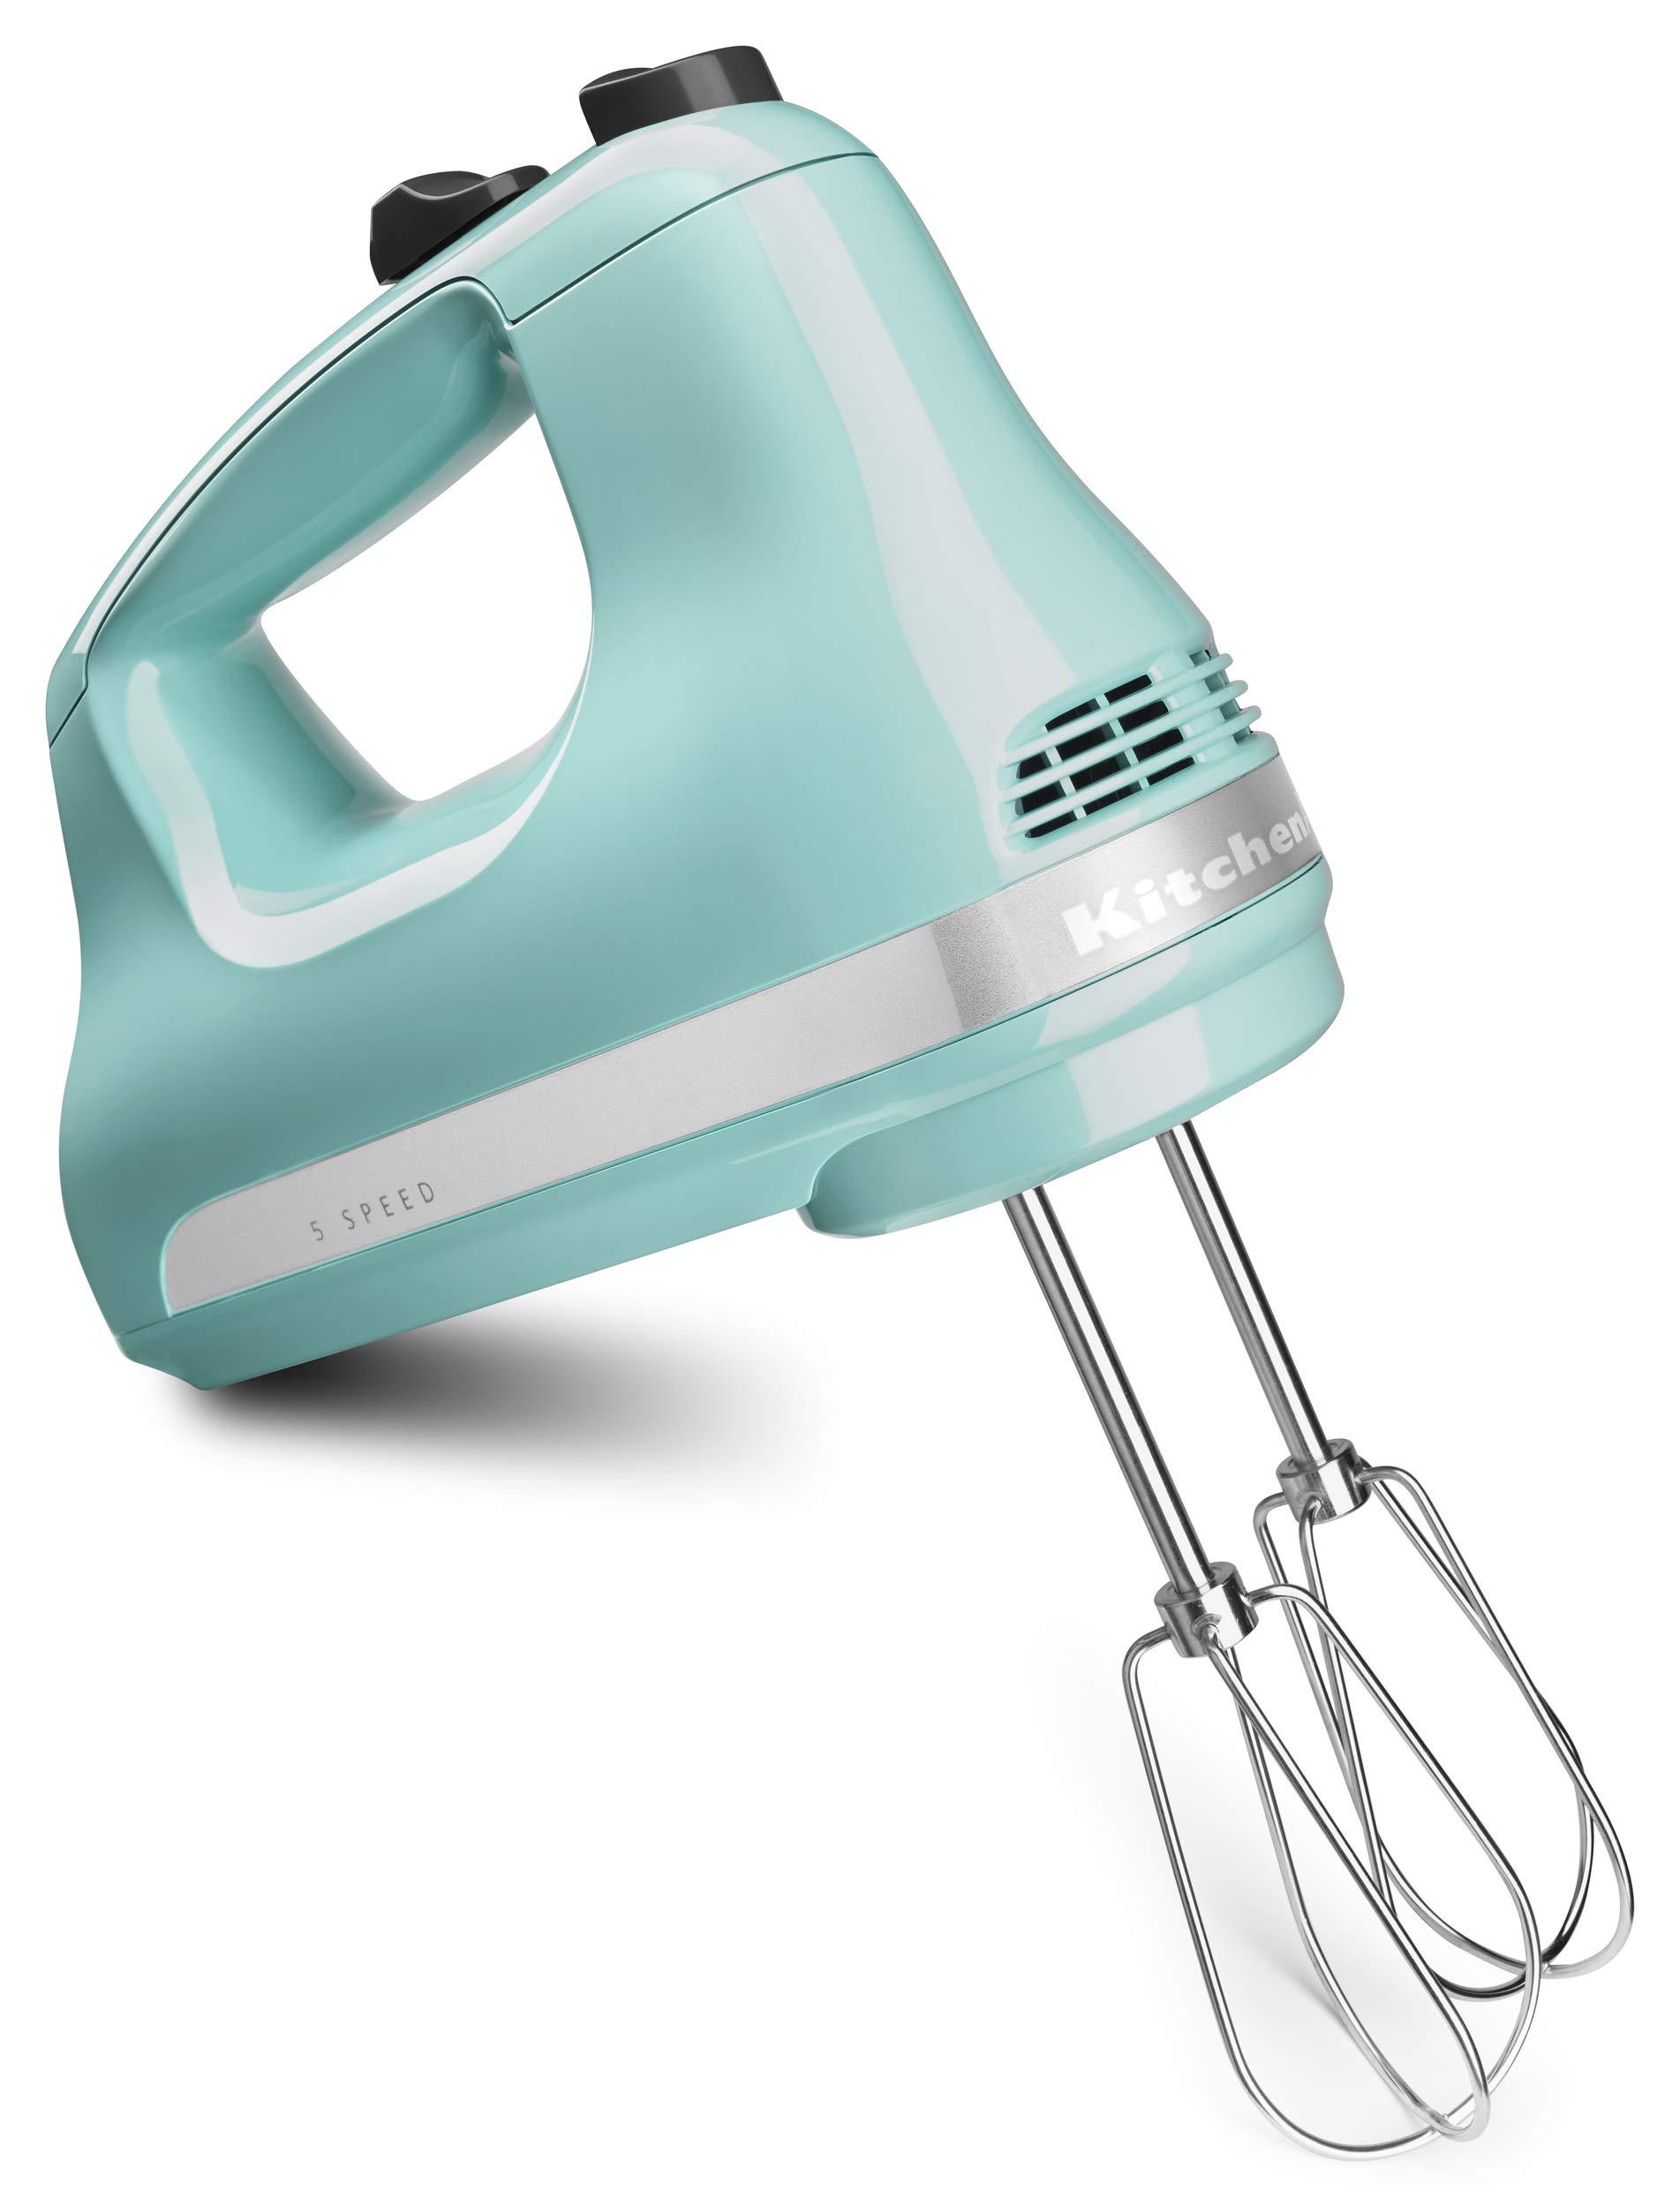 KitchenAid KHM512AQ Pro Line 5 Speed Hand Mixer, Aqua Sky by KitchenAid